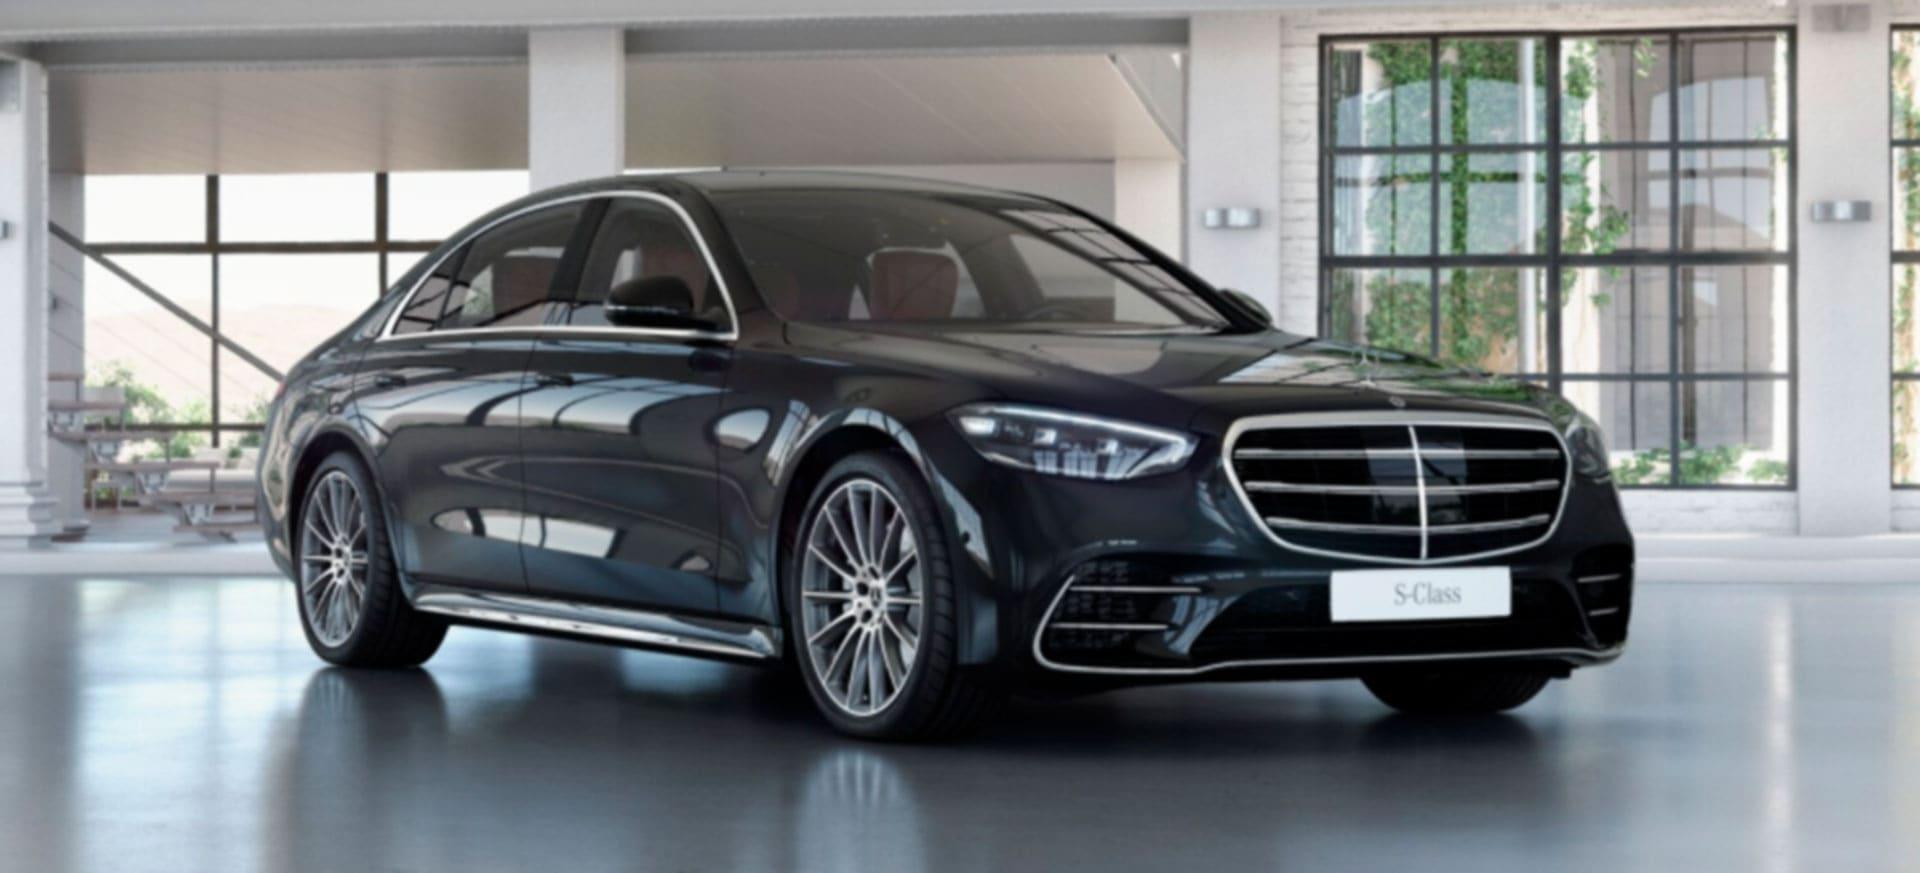 Mercedes-Benz S-Class Limousine 0152601552